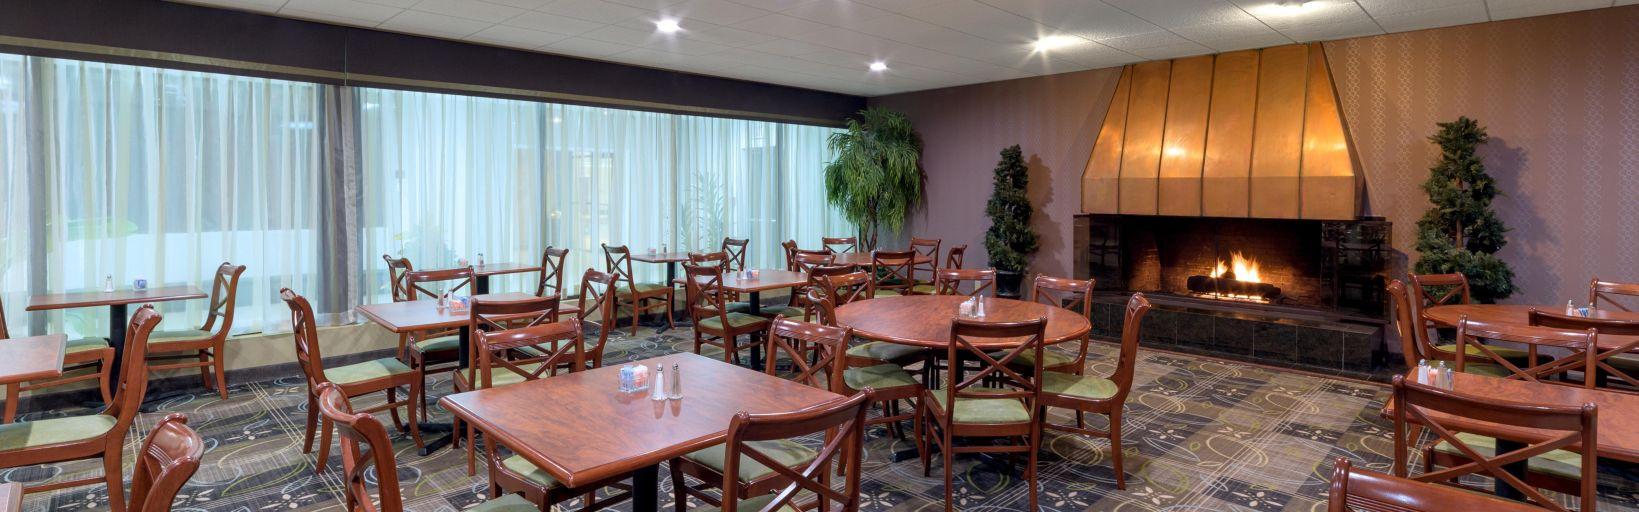 Restaurant Catering Dining Meeting Room Holiday Inn